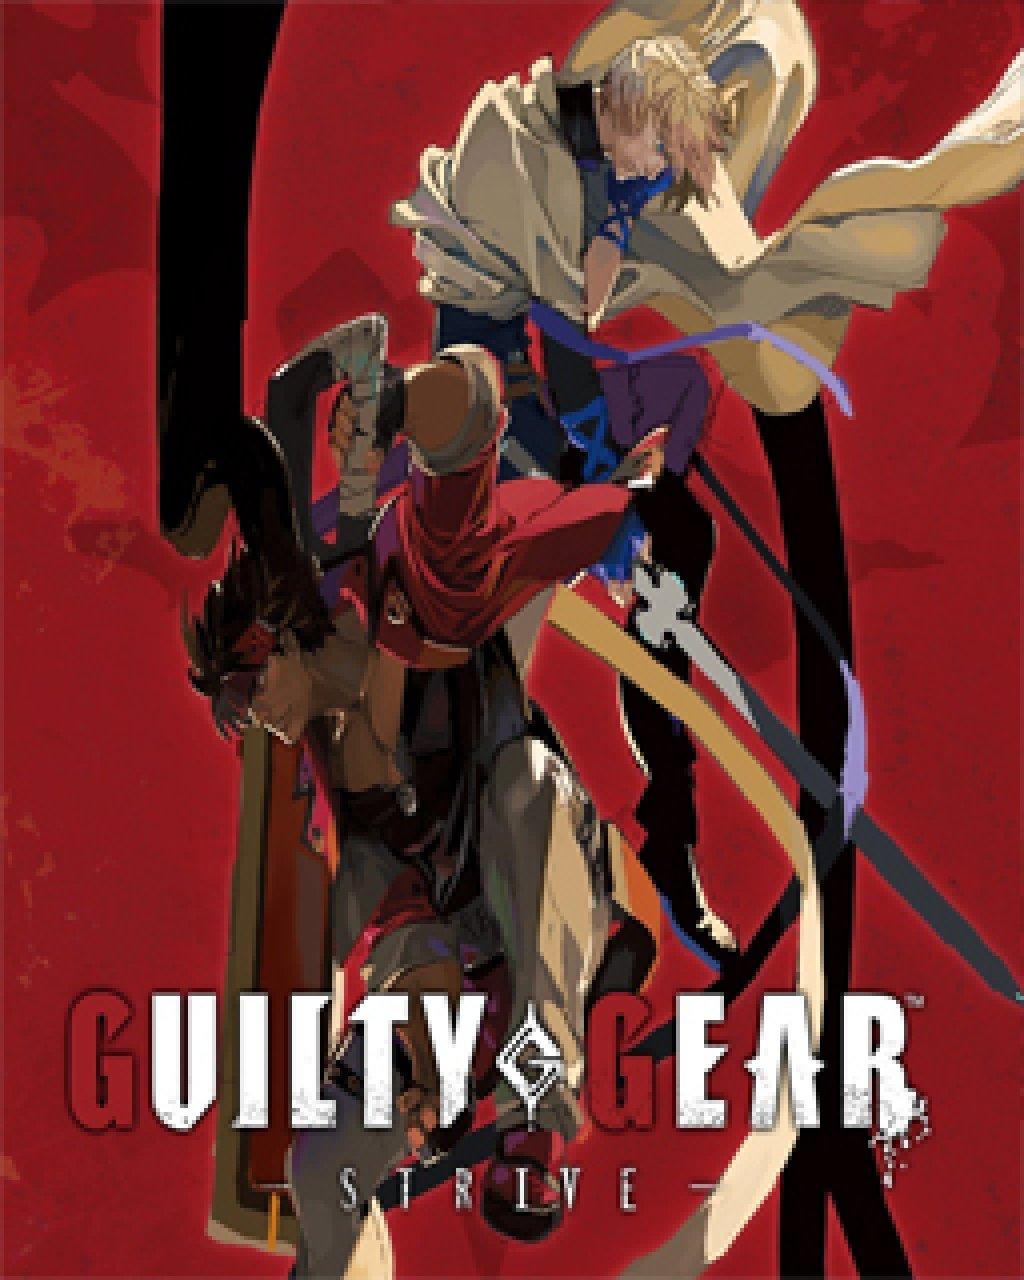 ESD Guilty Gear Strive